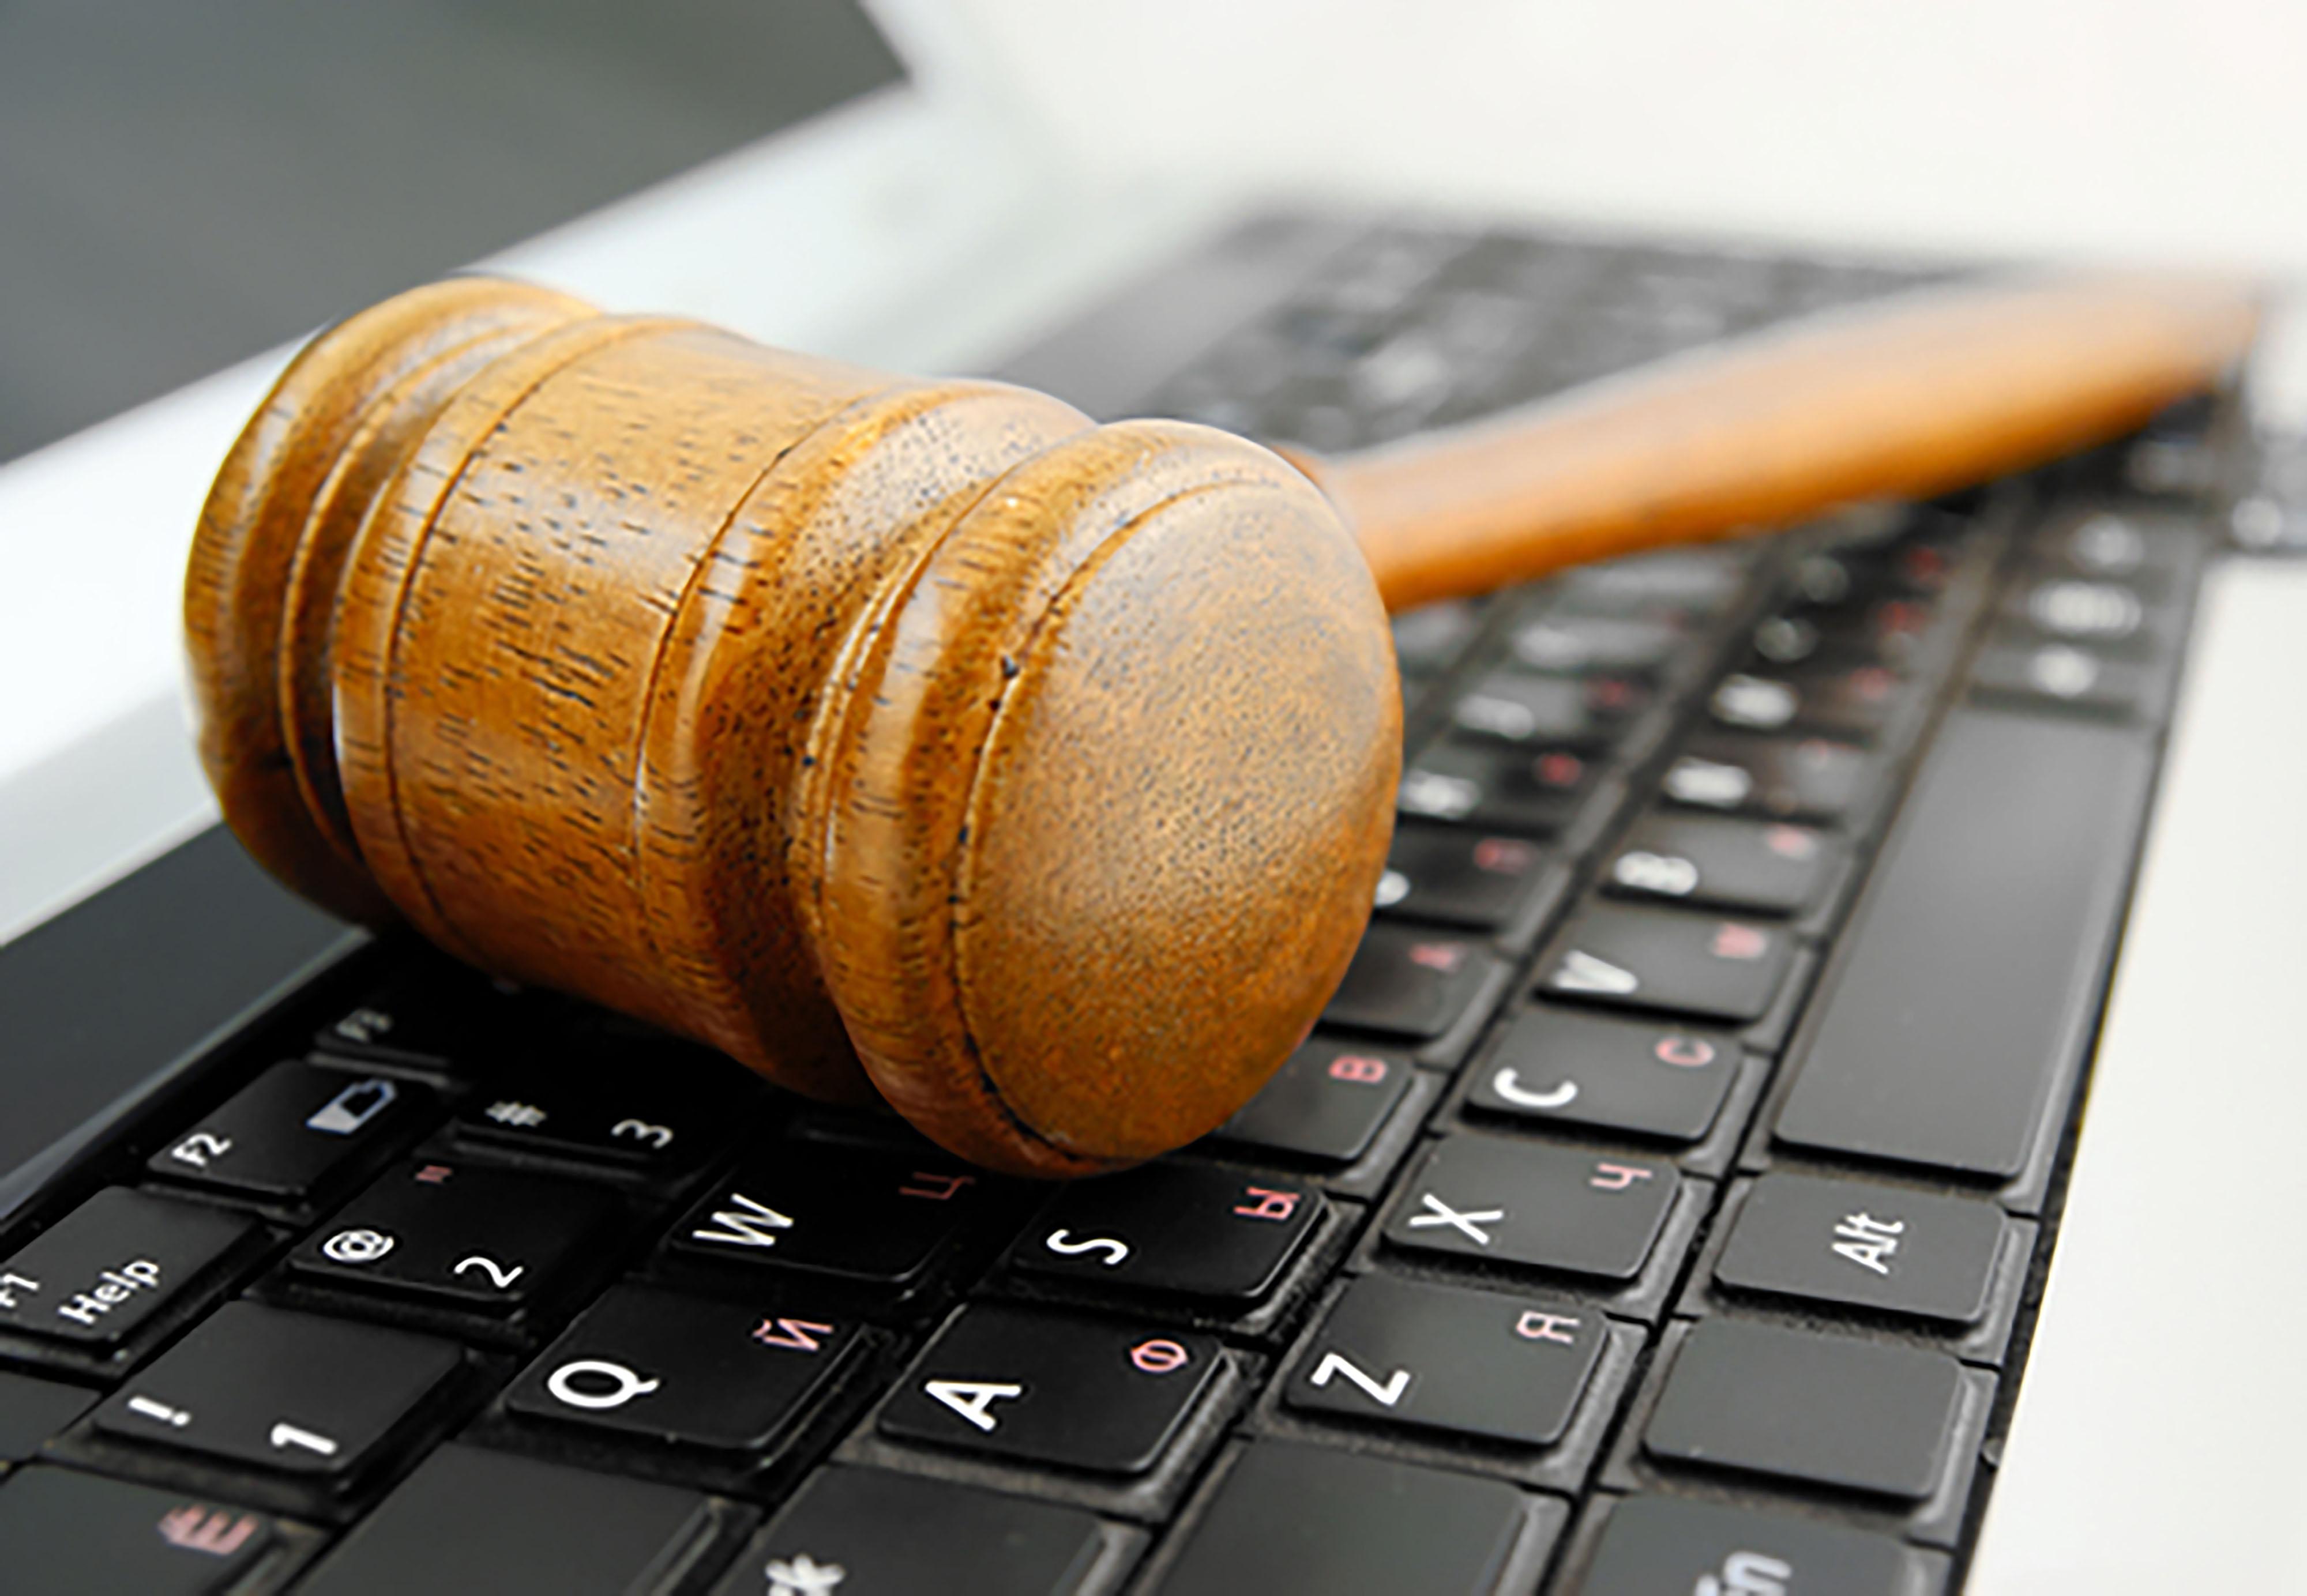 justice, court, doj, trial, gavel, antitrust, google